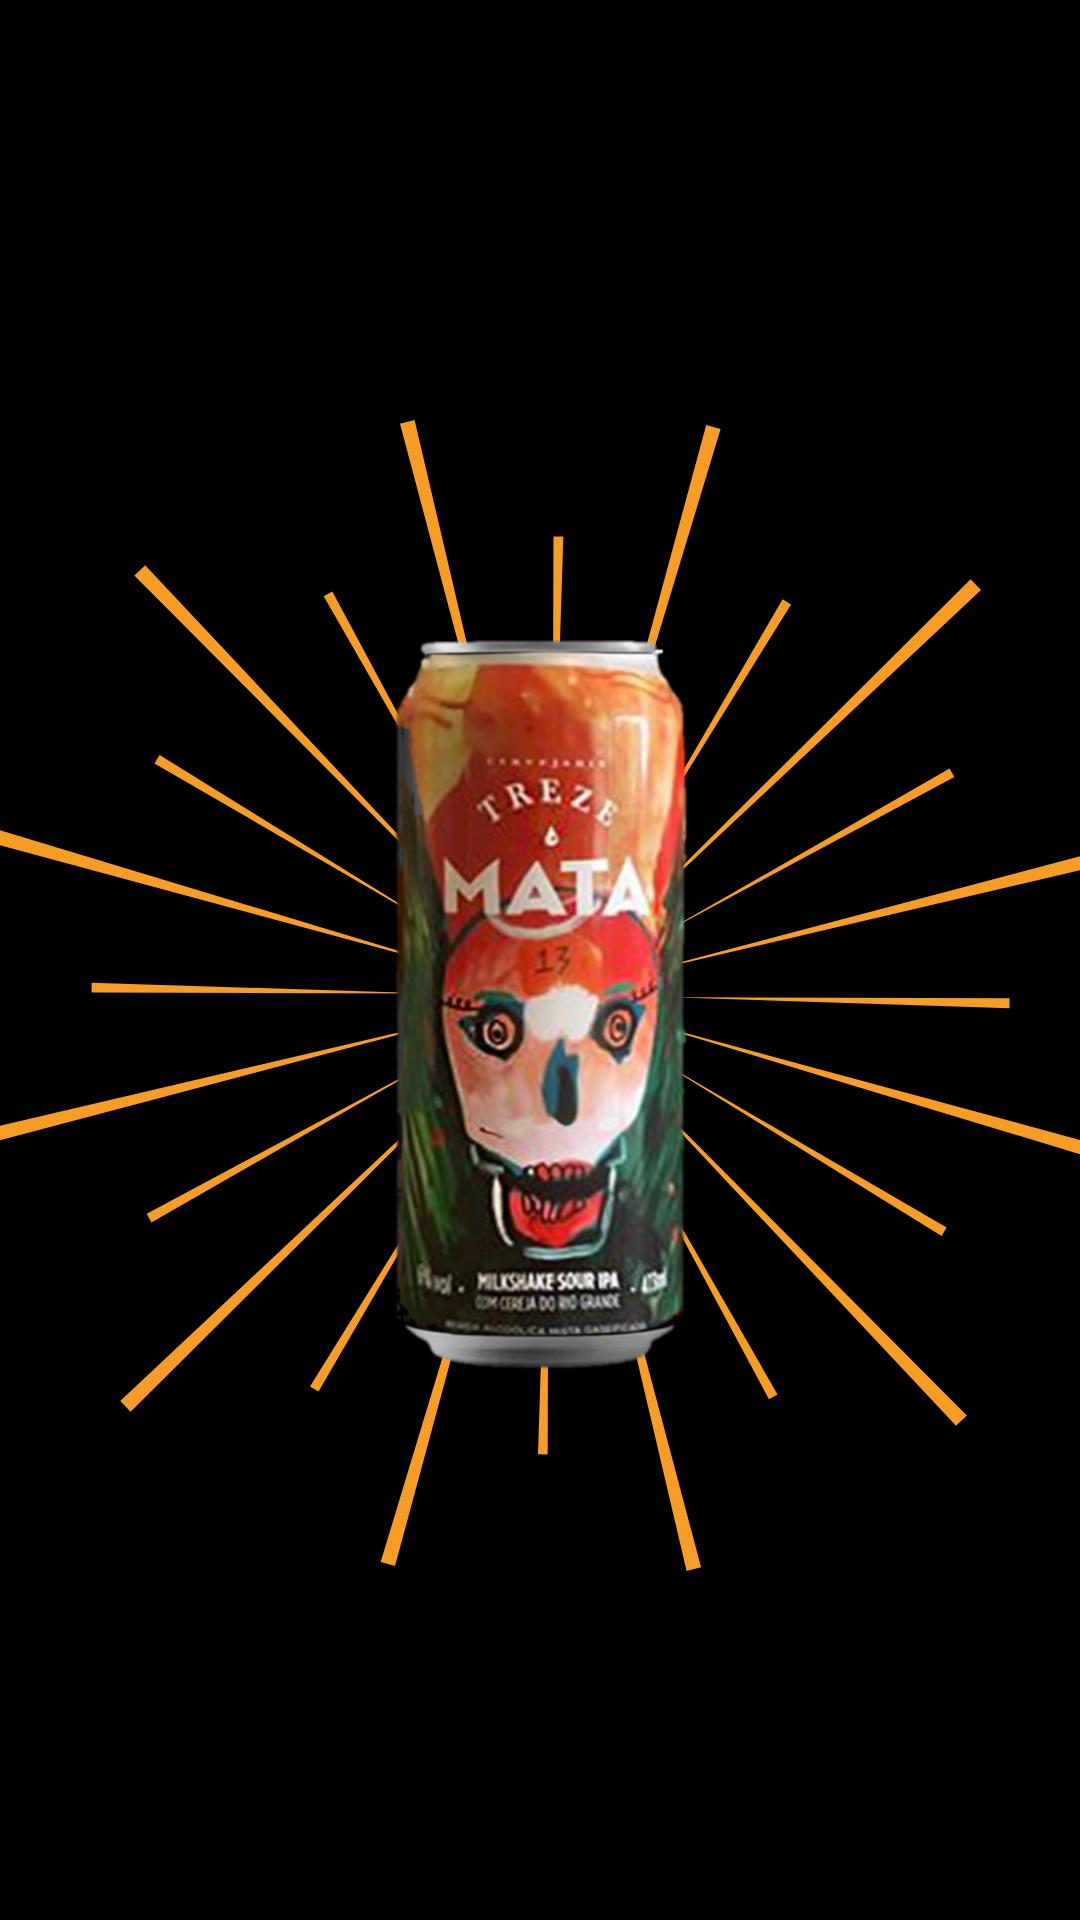 Mata Milk Shake Sour IPA – Treze